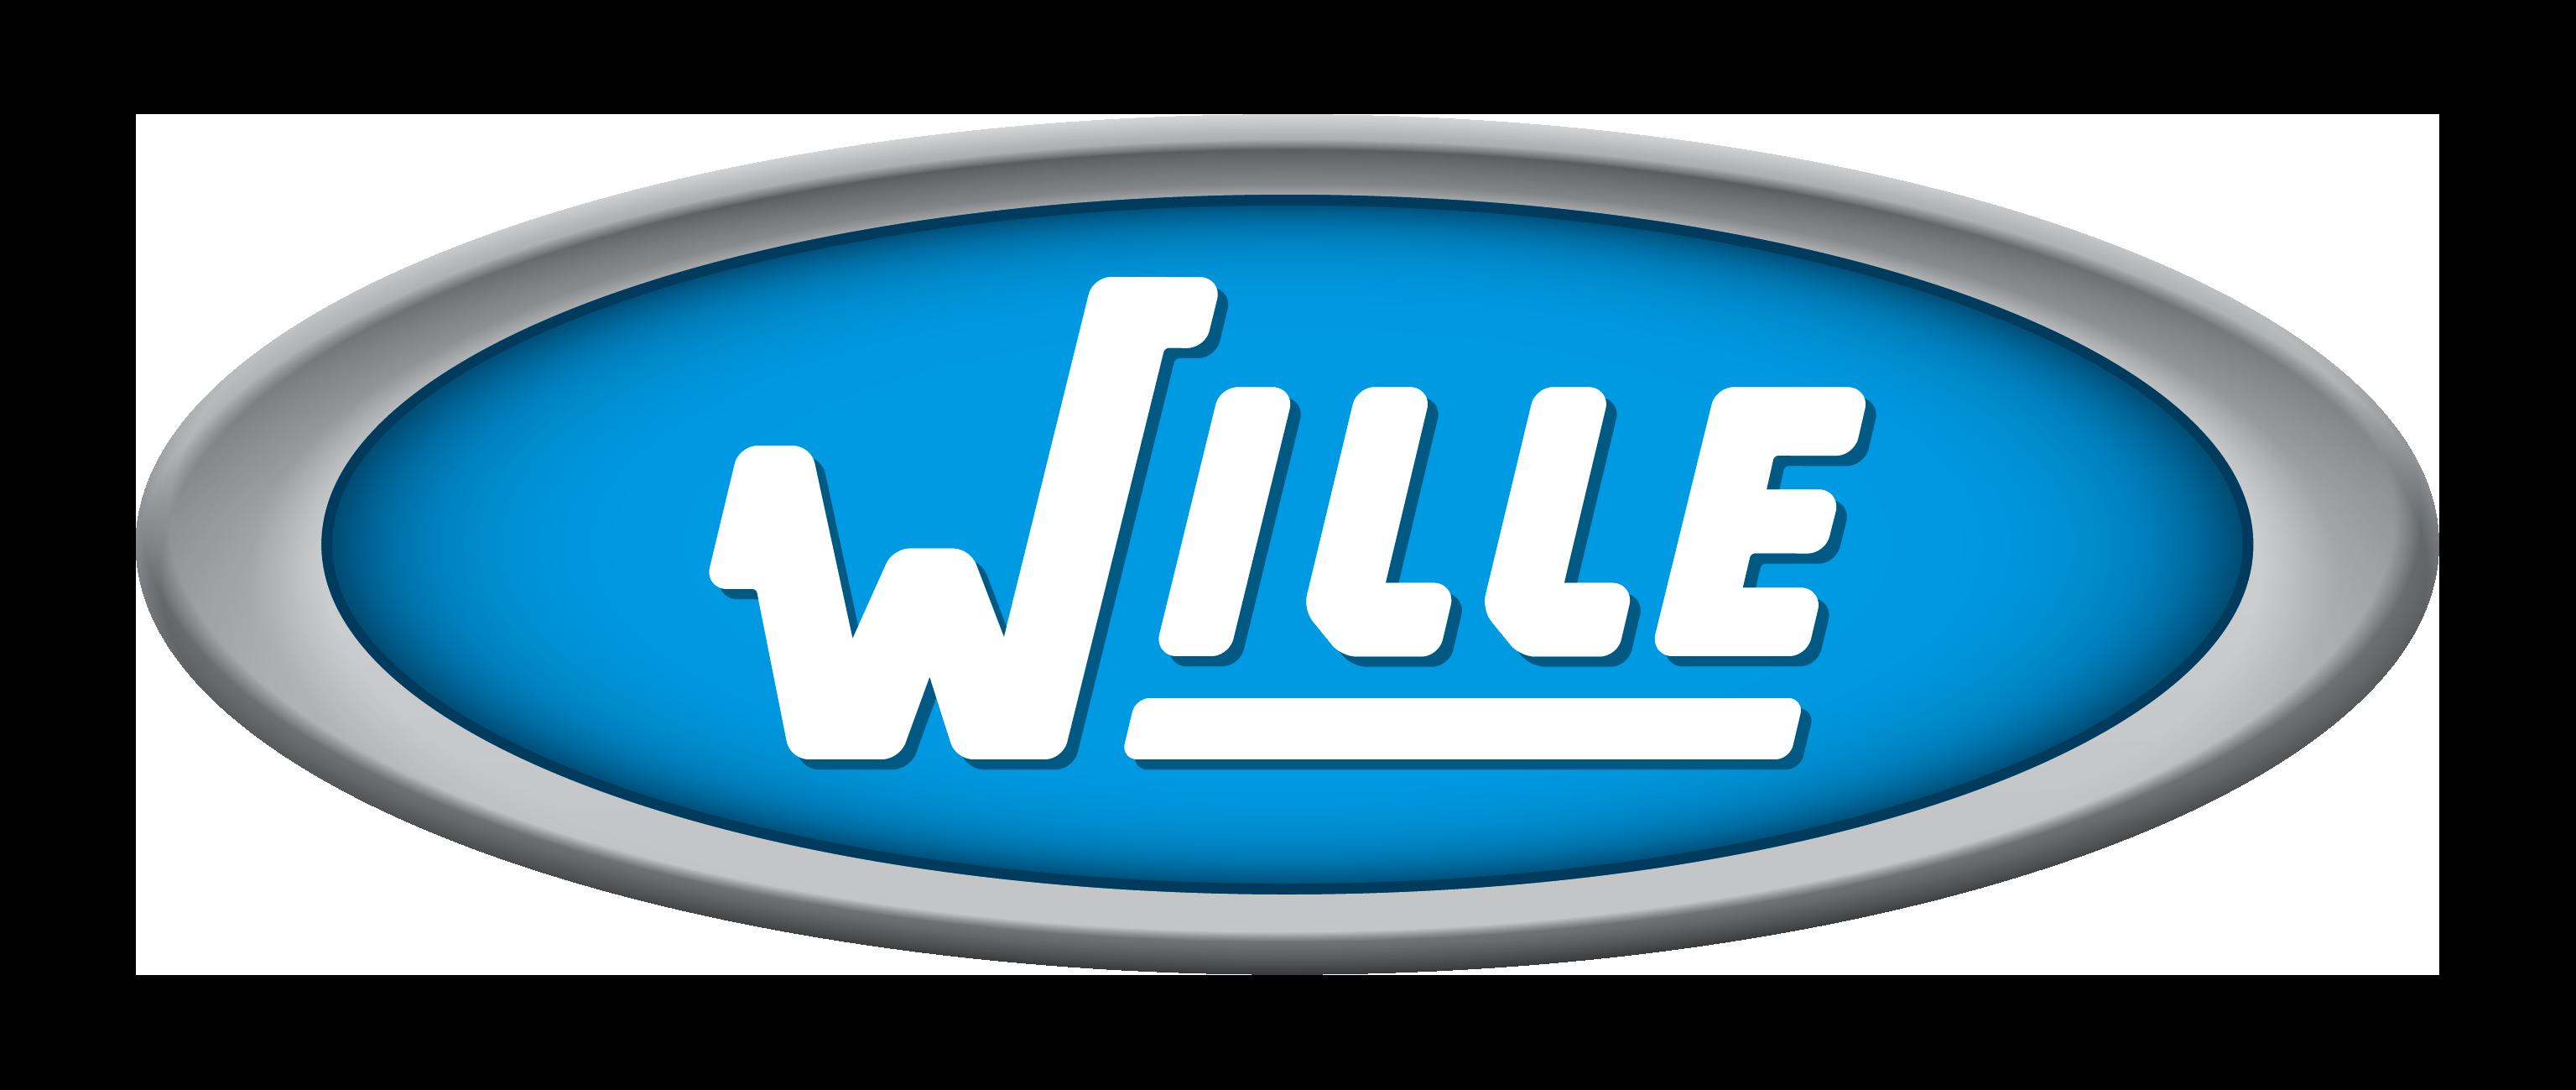 WILLE - LOGO UTILAJE MULTIFUNCTIONALE